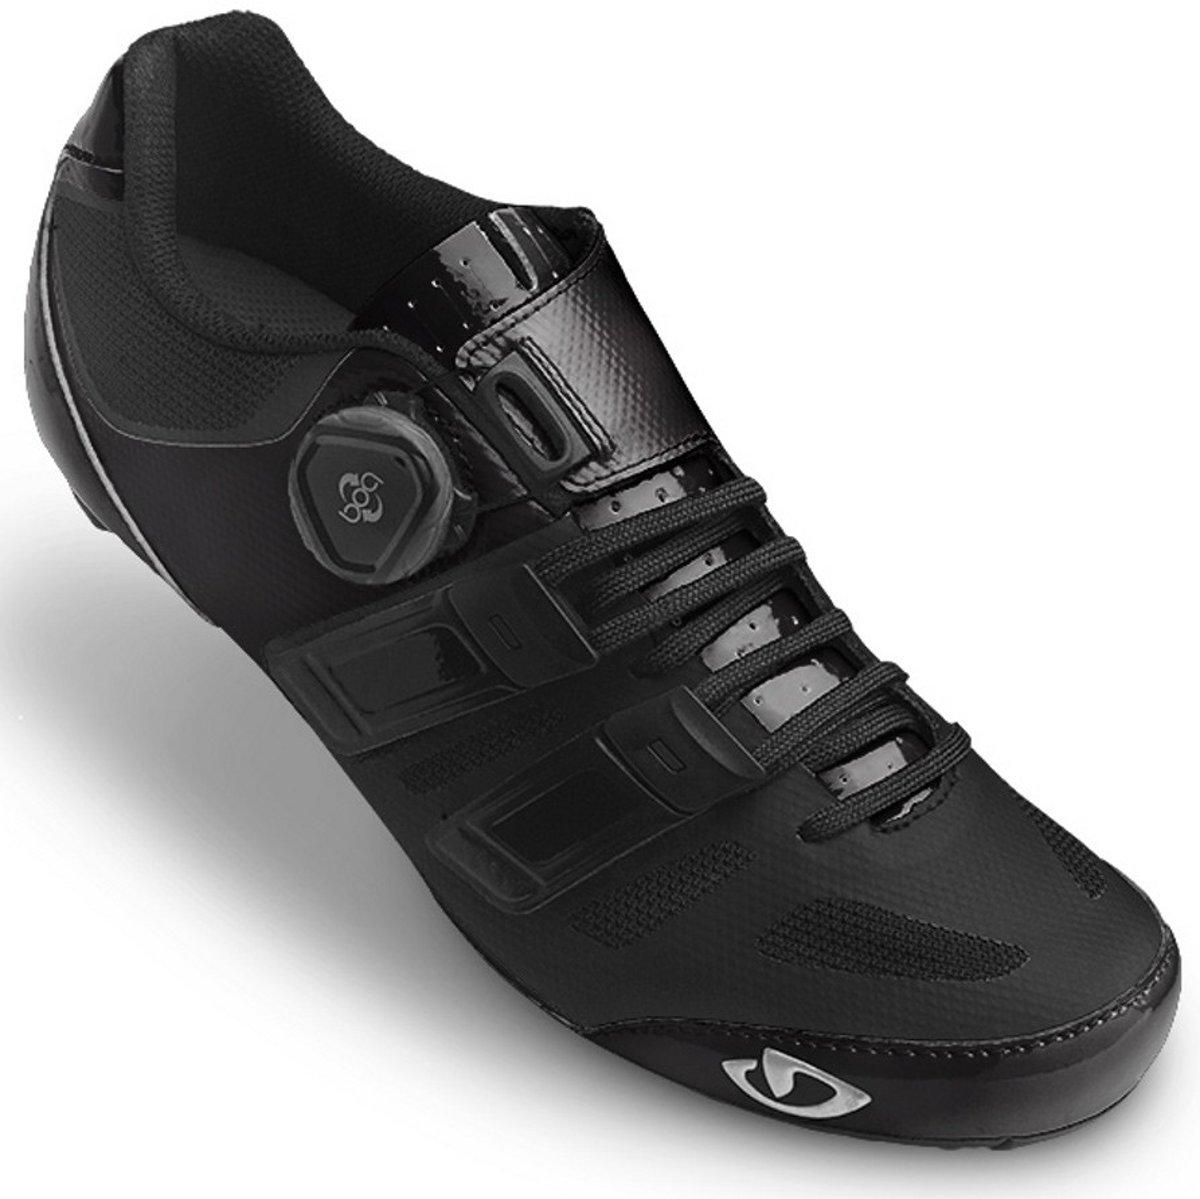 Giro Raes Techlace Schoenen Dames, black Schoenmaat EU 38,5